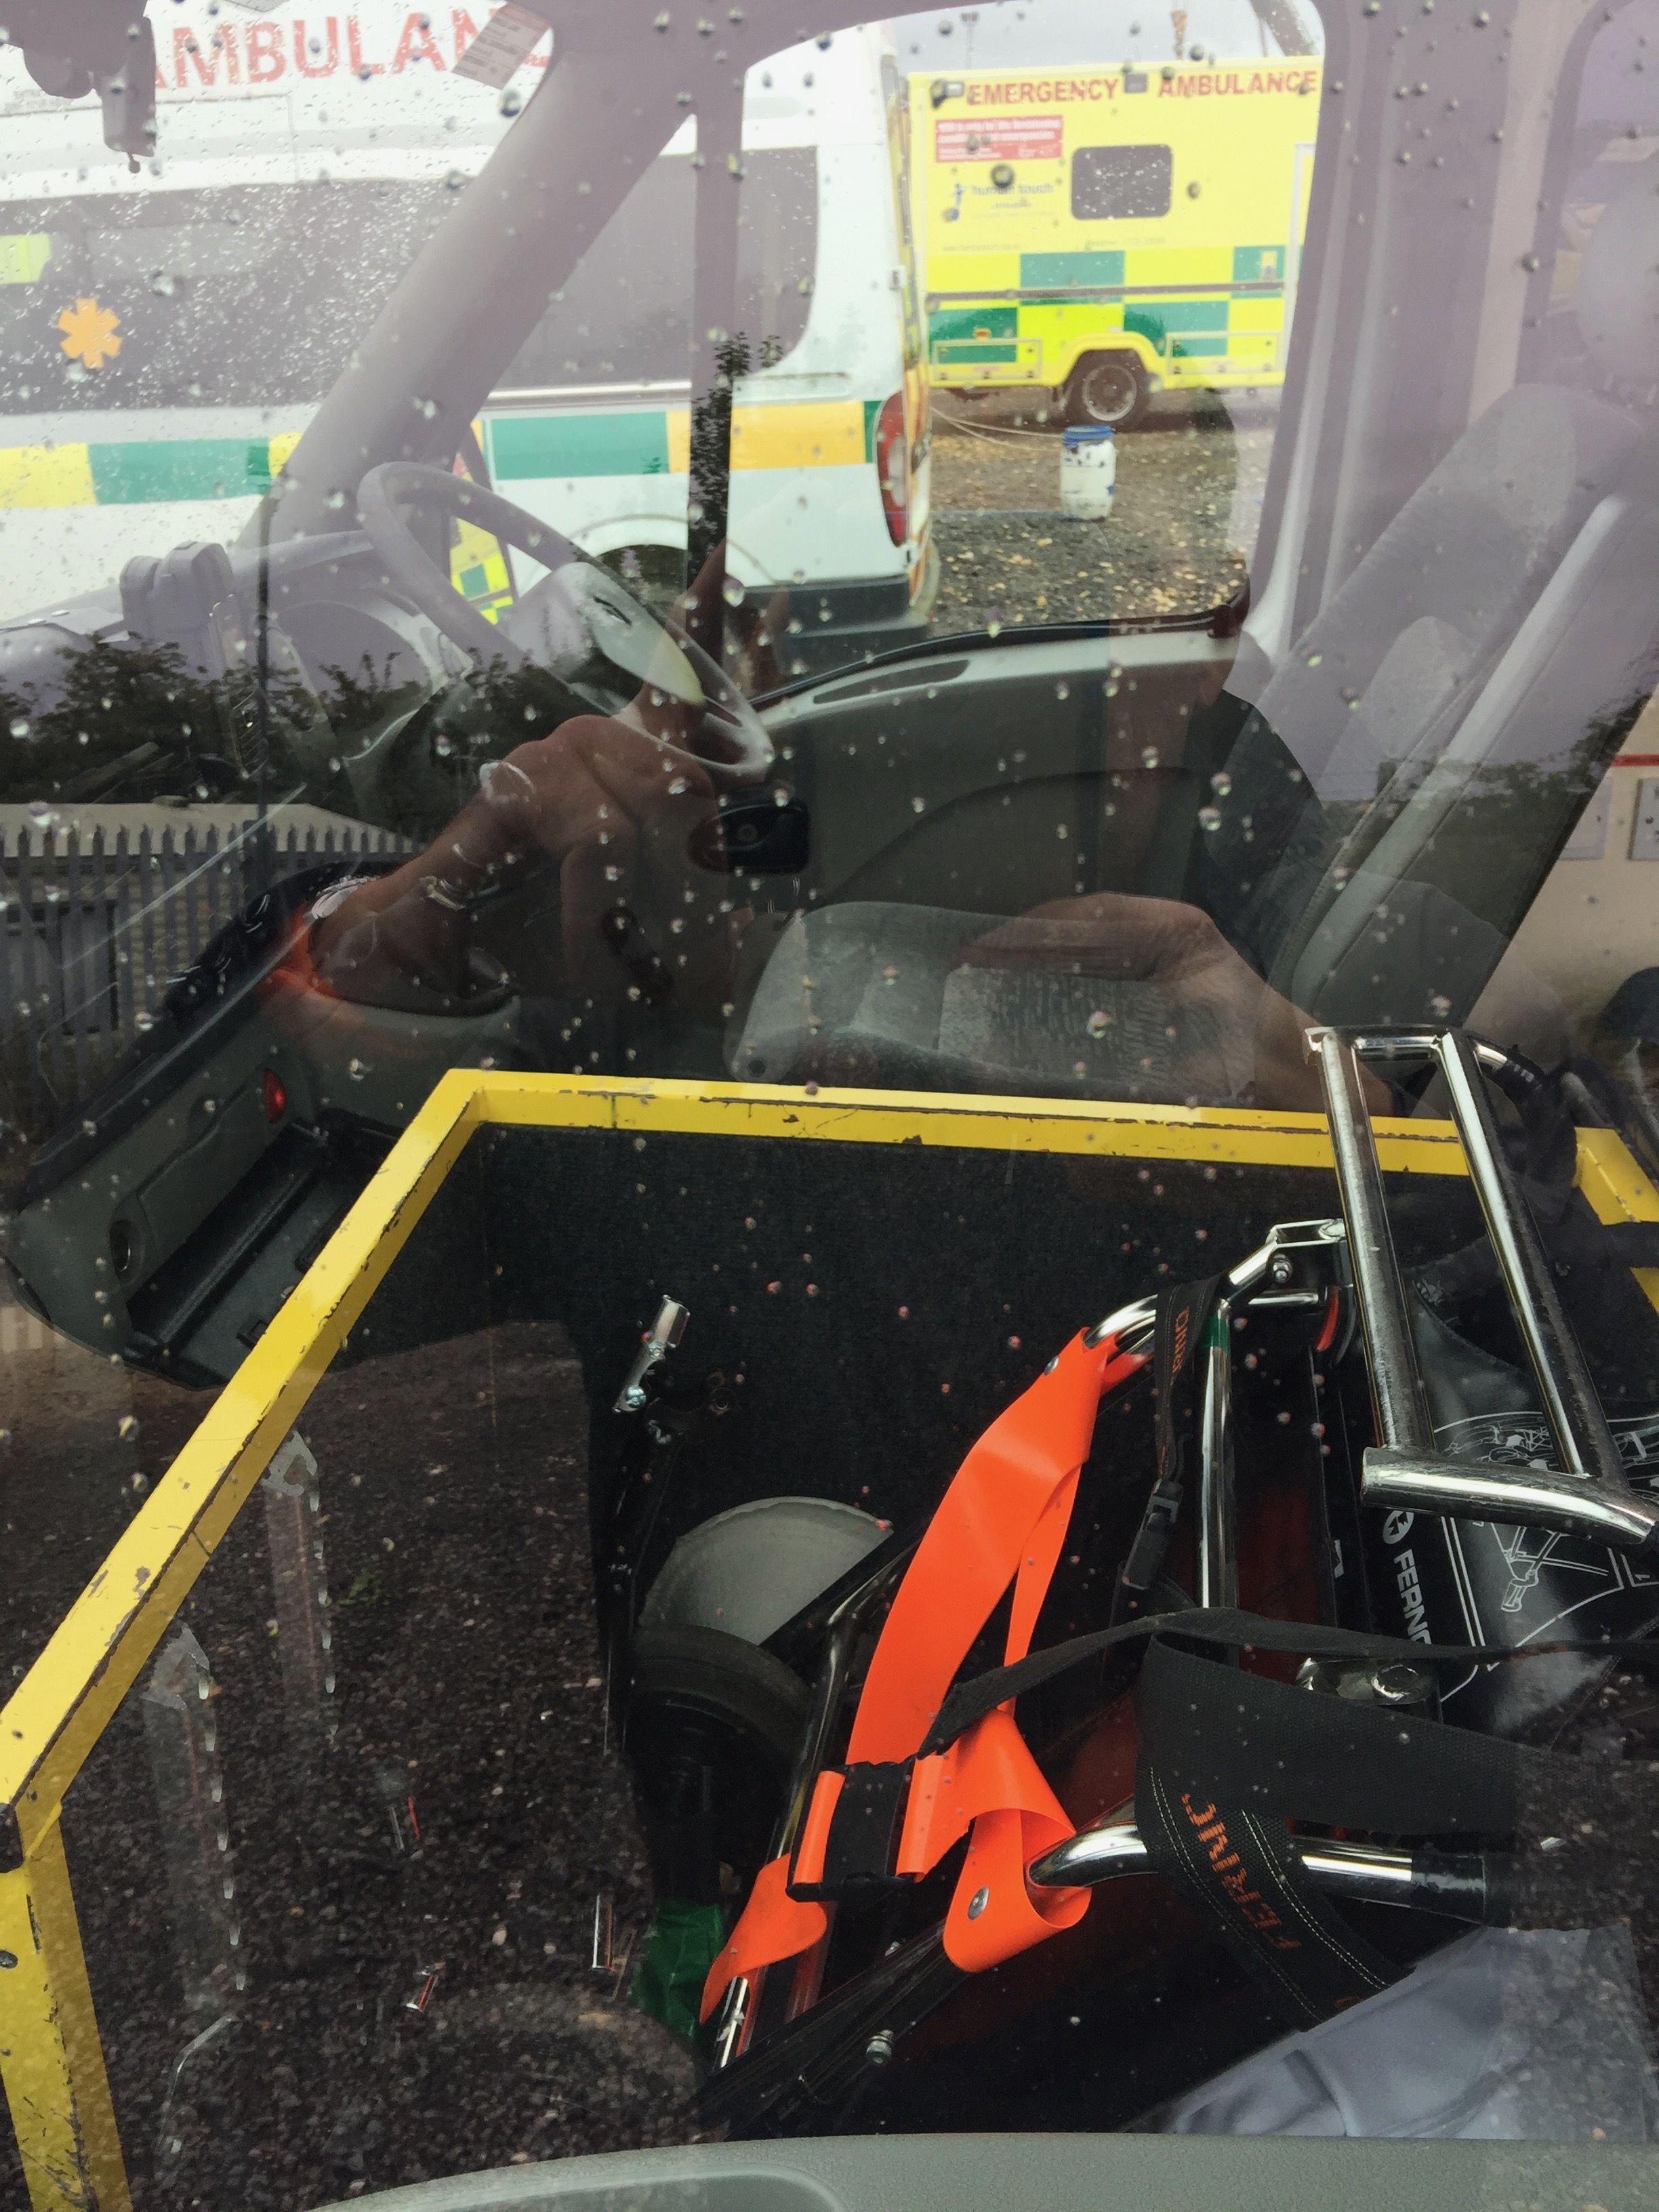 Lot 11 - Renault Master standard body patient transfer ambulance Registration NoGN05 SXD, recorded miles